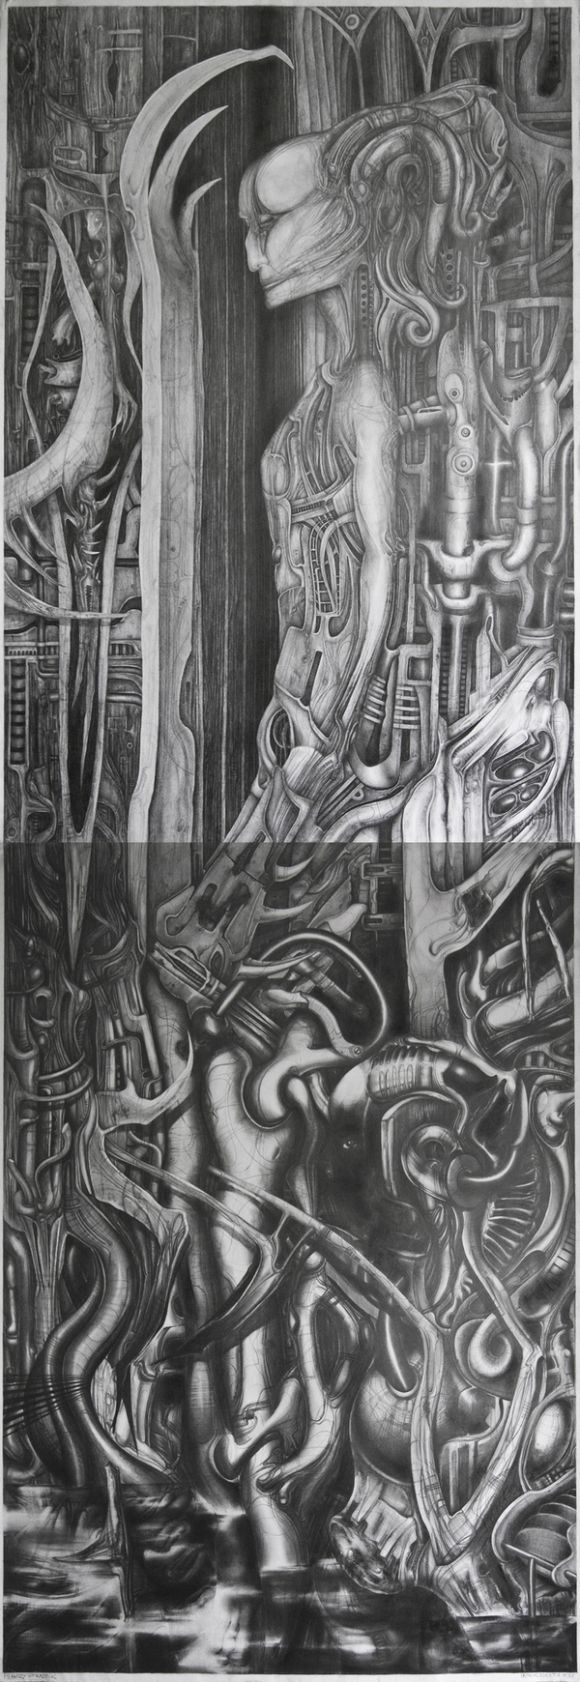 AxisCylinders DUT Amazing Pencil Drawings by Patryk Kuleta